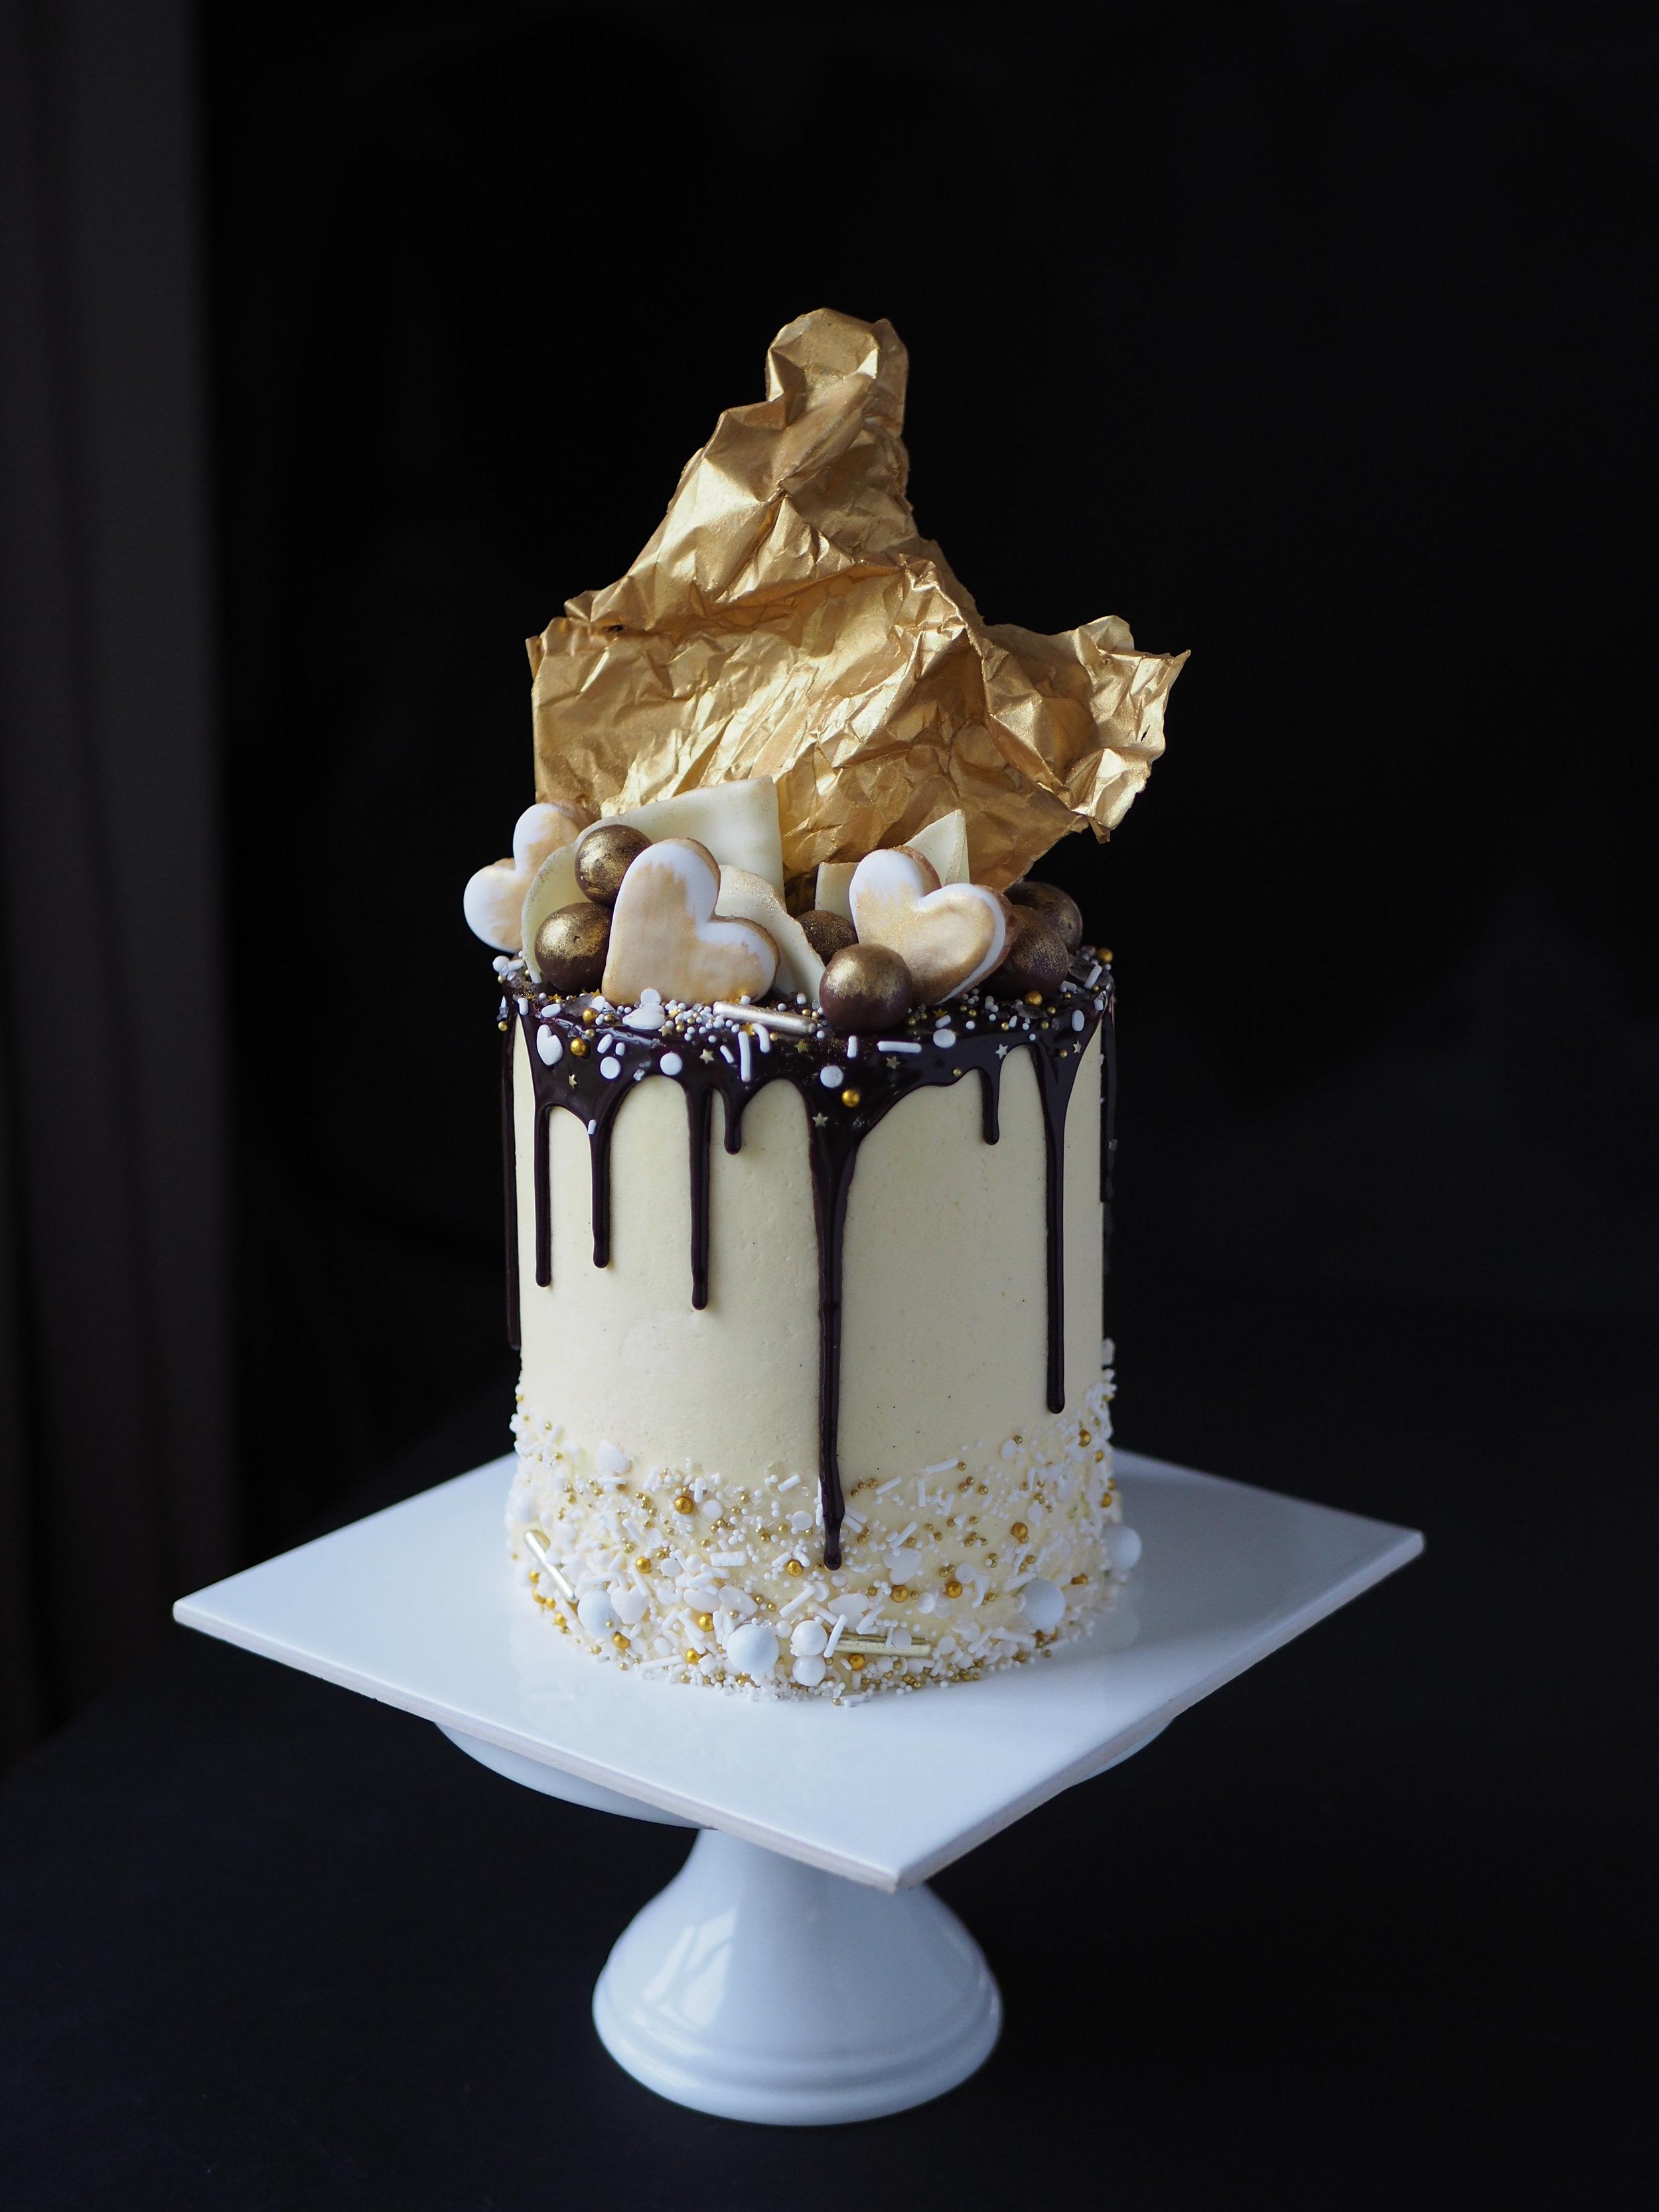 2017-06-02 Metallic drip cake 046.JPG